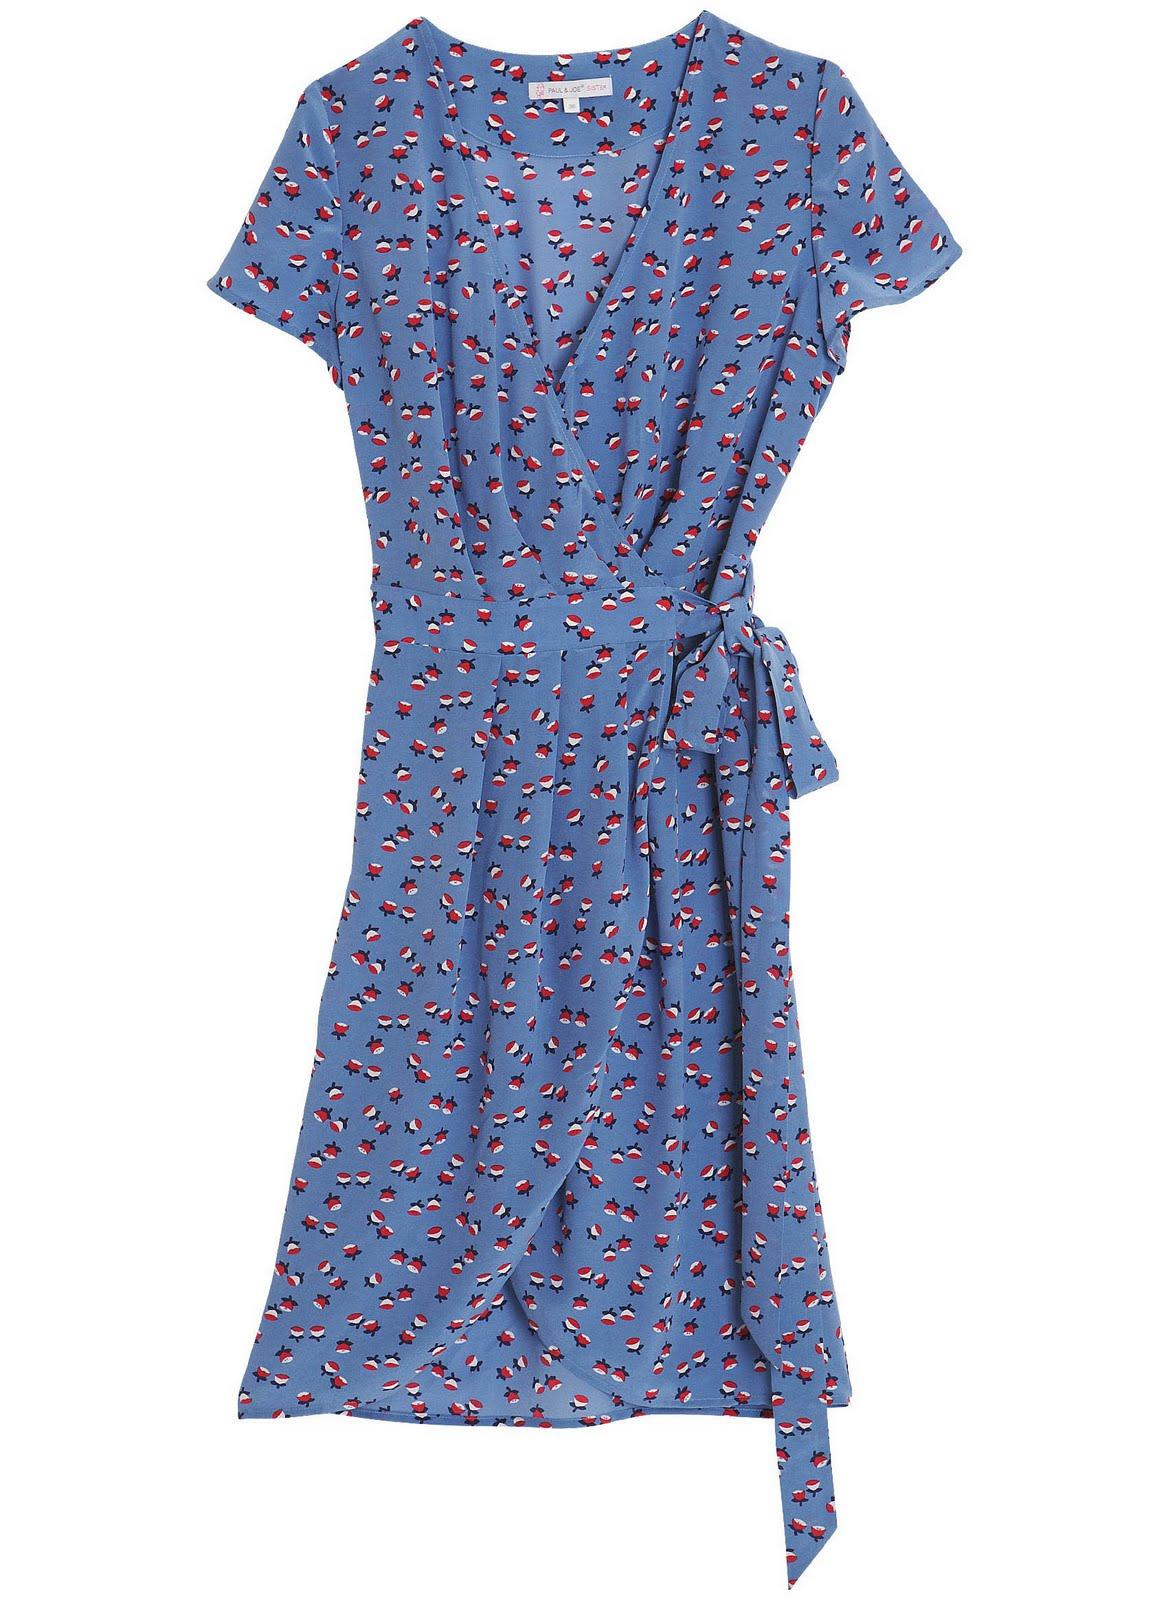 hidden gem paul joe sister paris printed wrap dress. Black Bedroom Furniture Sets. Home Design Ideas